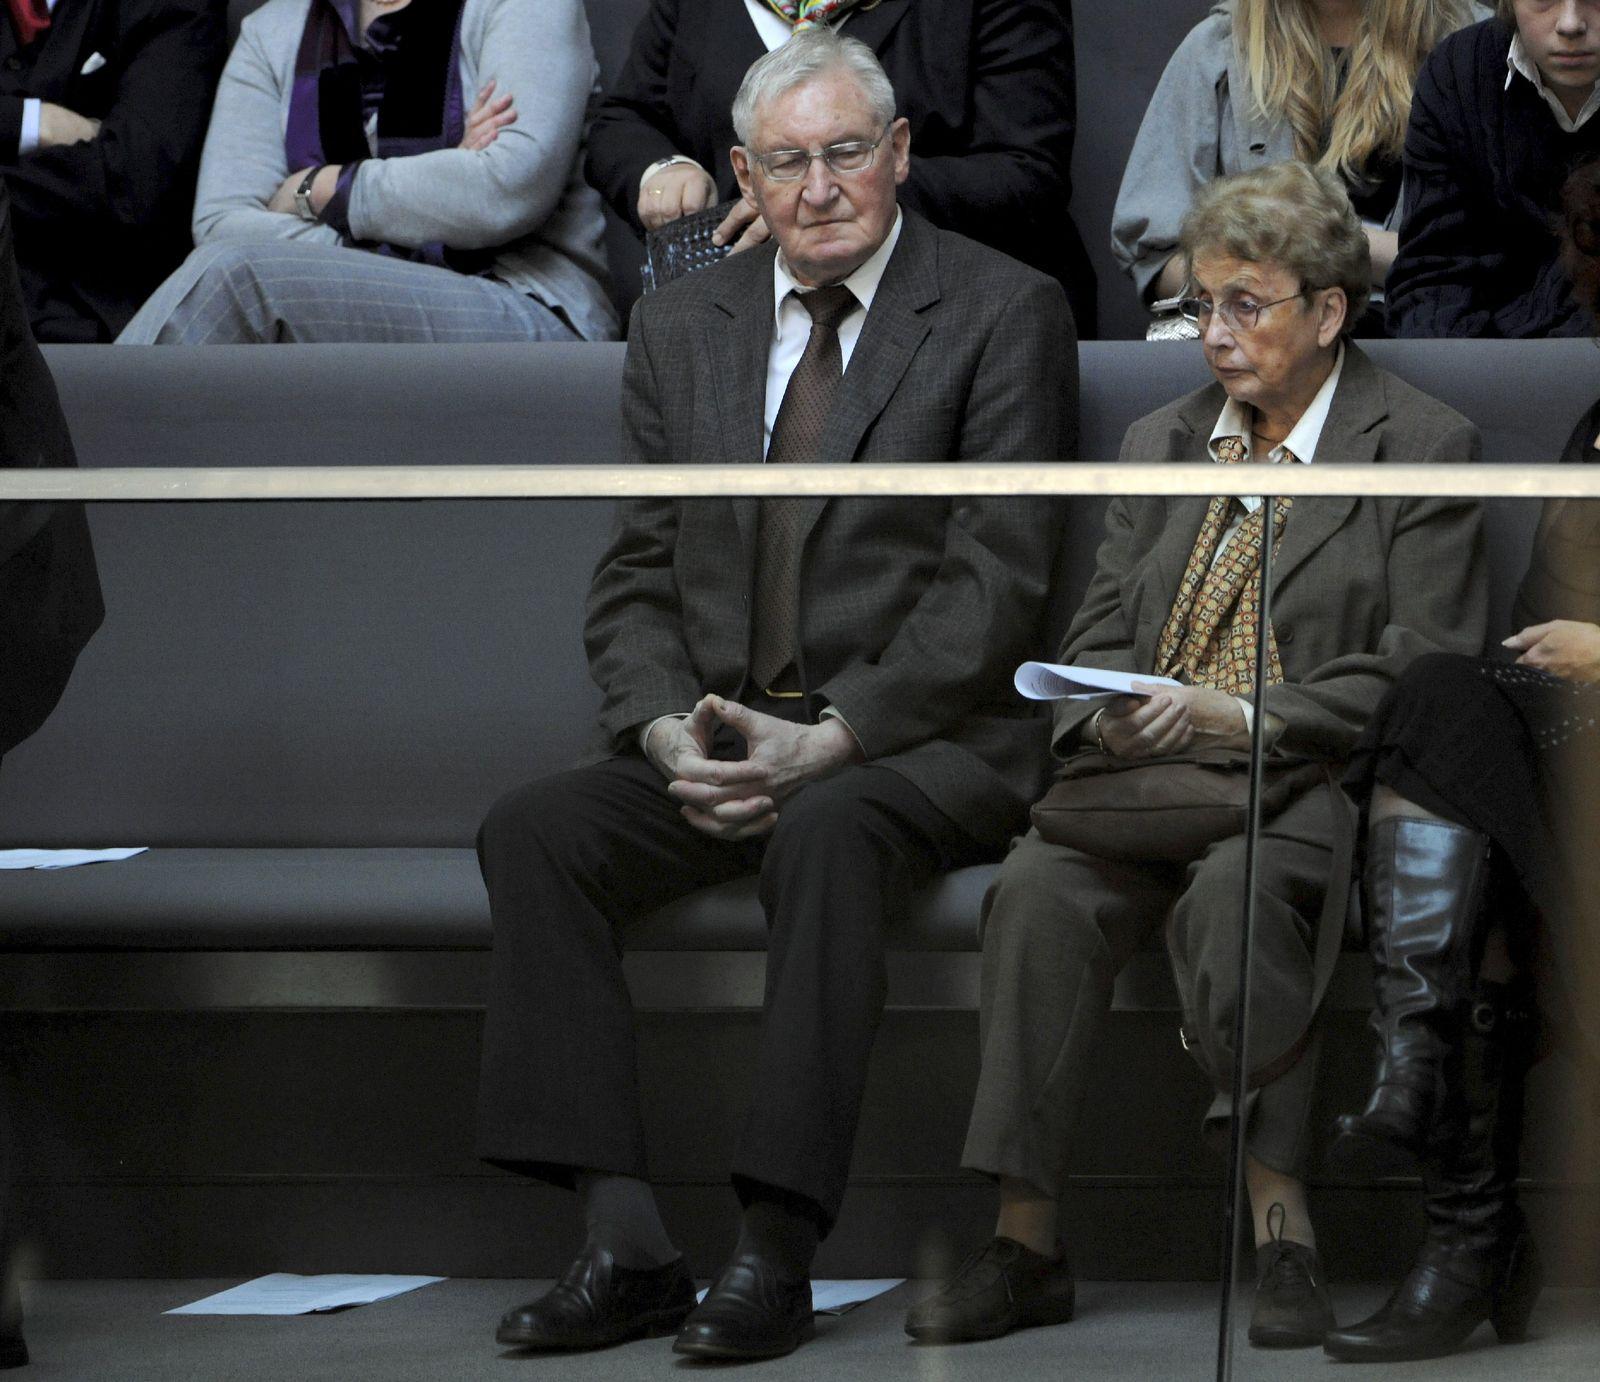 Bundestag - Merkel vor Wiederwahl